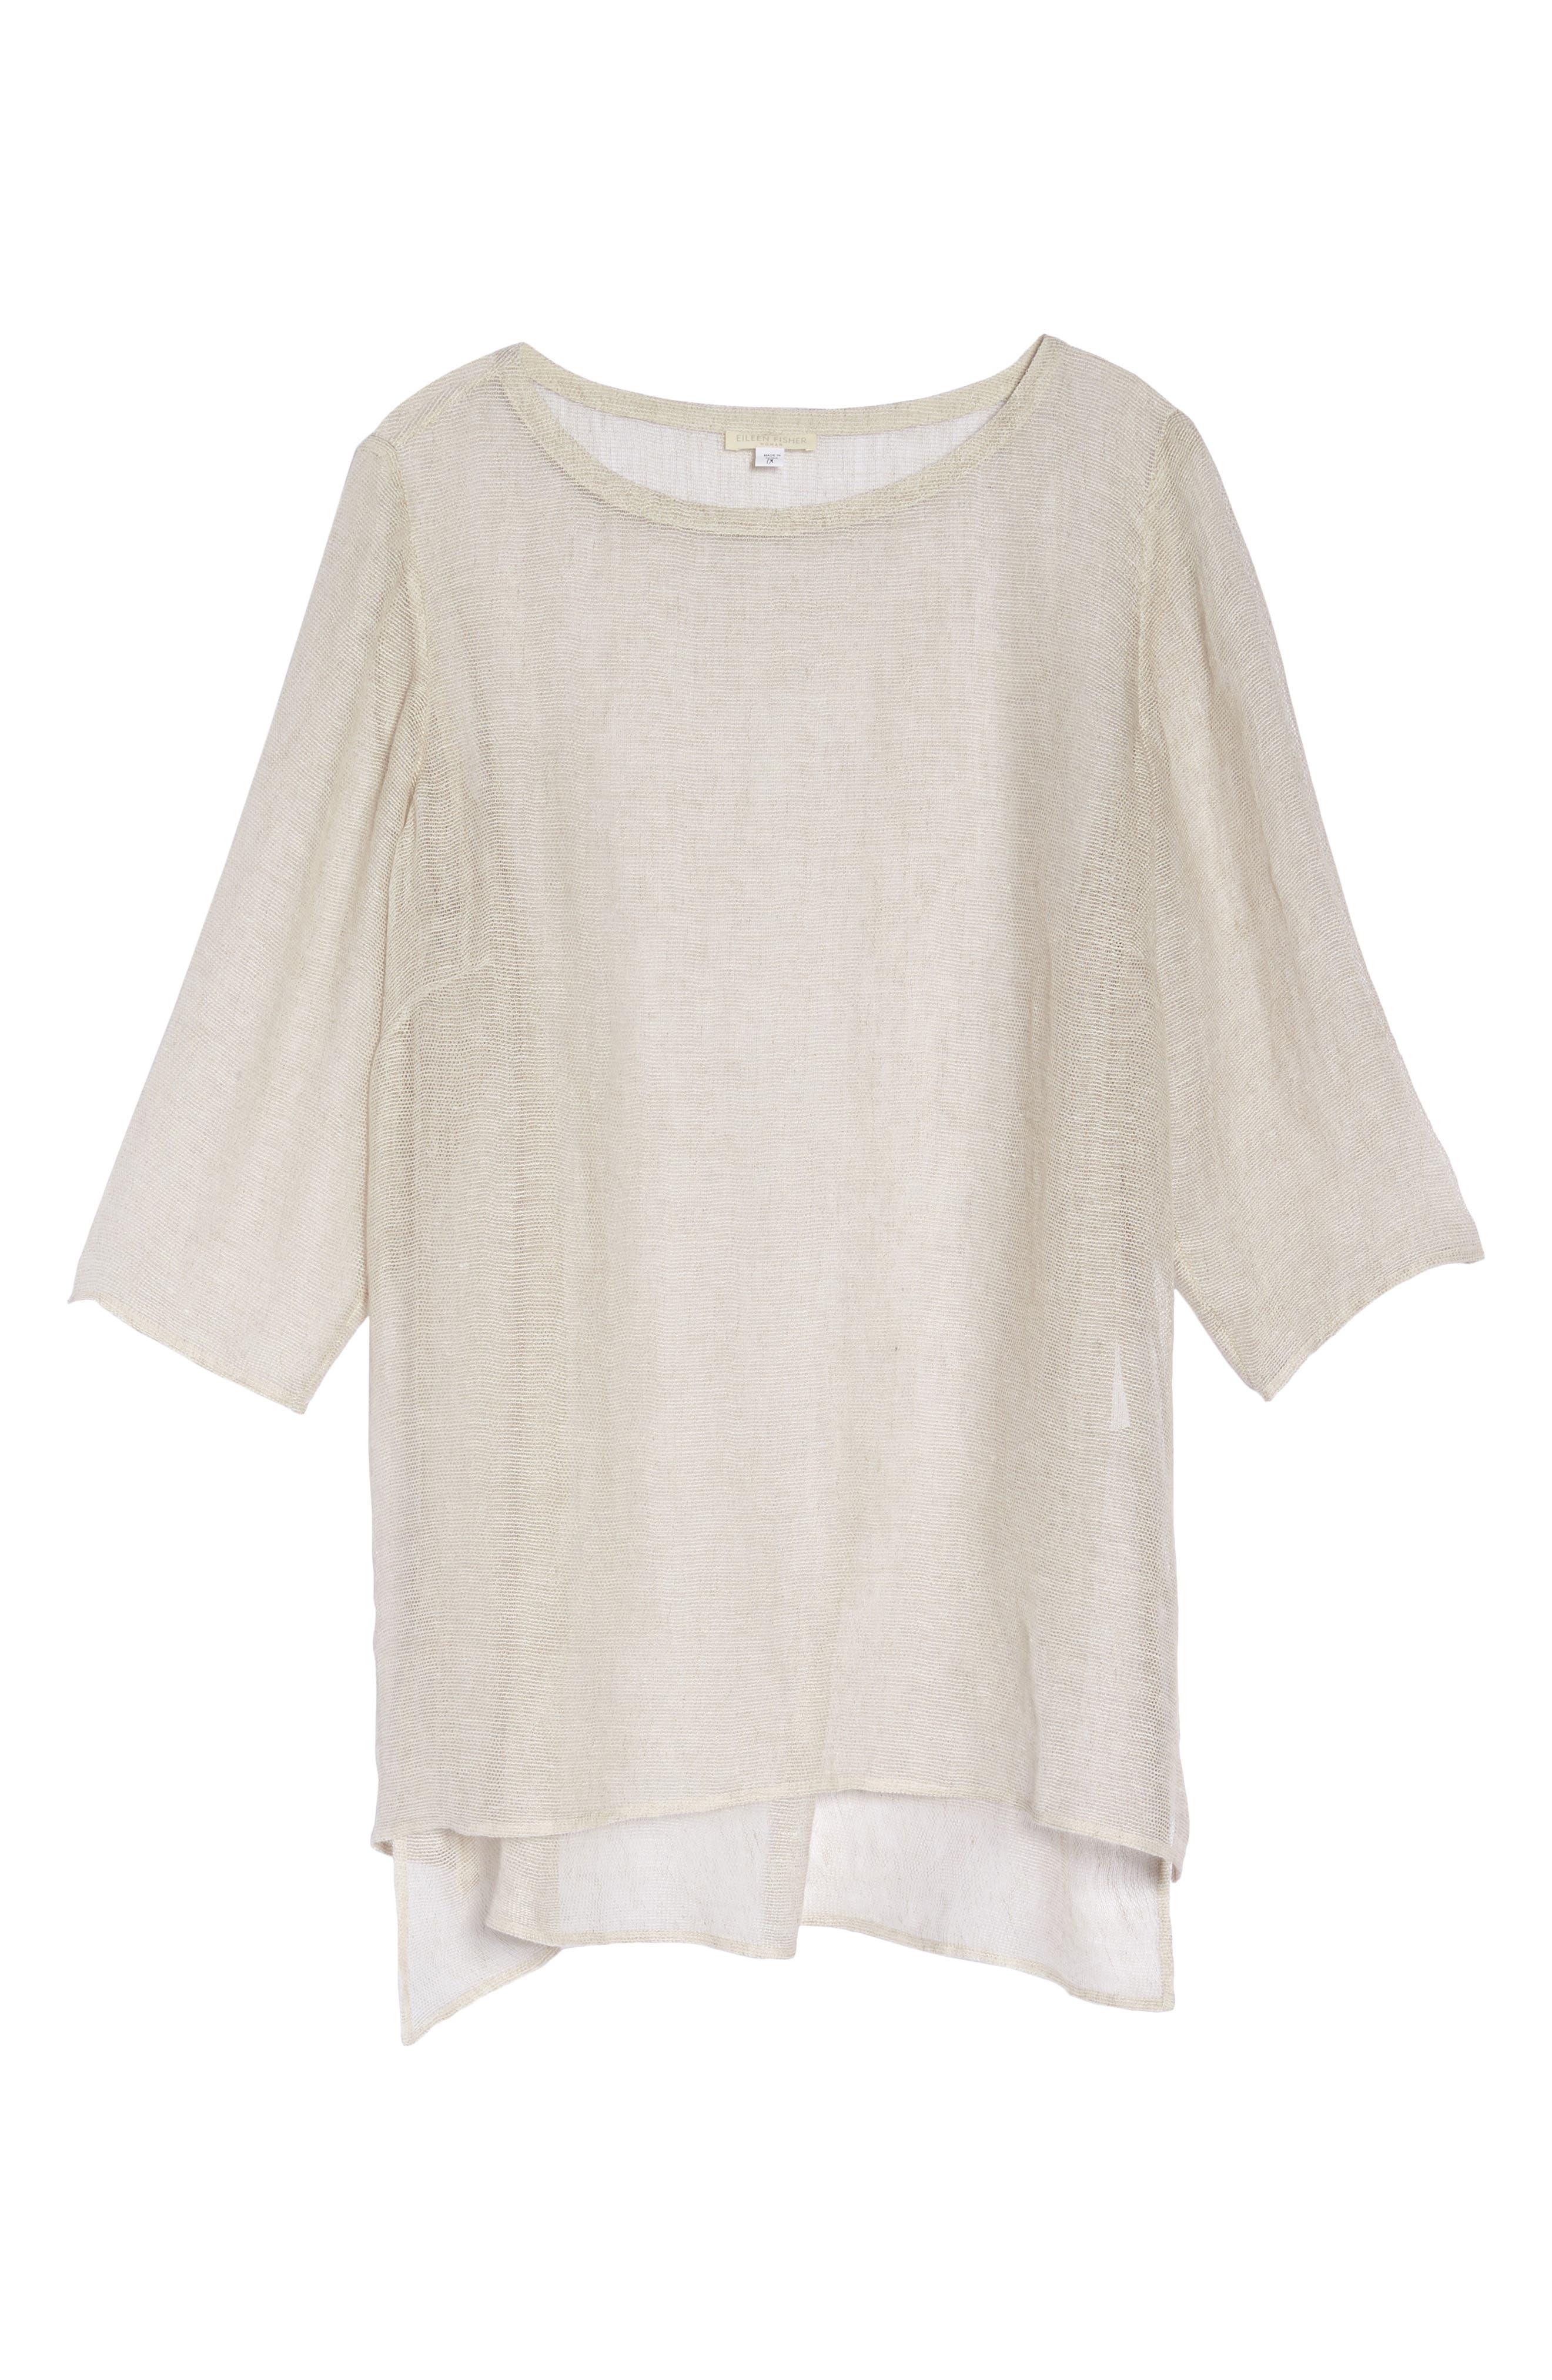 Organic Linen Mesh Tunic,                             Alternate thumbnail 7, color,                             Undyed Natural